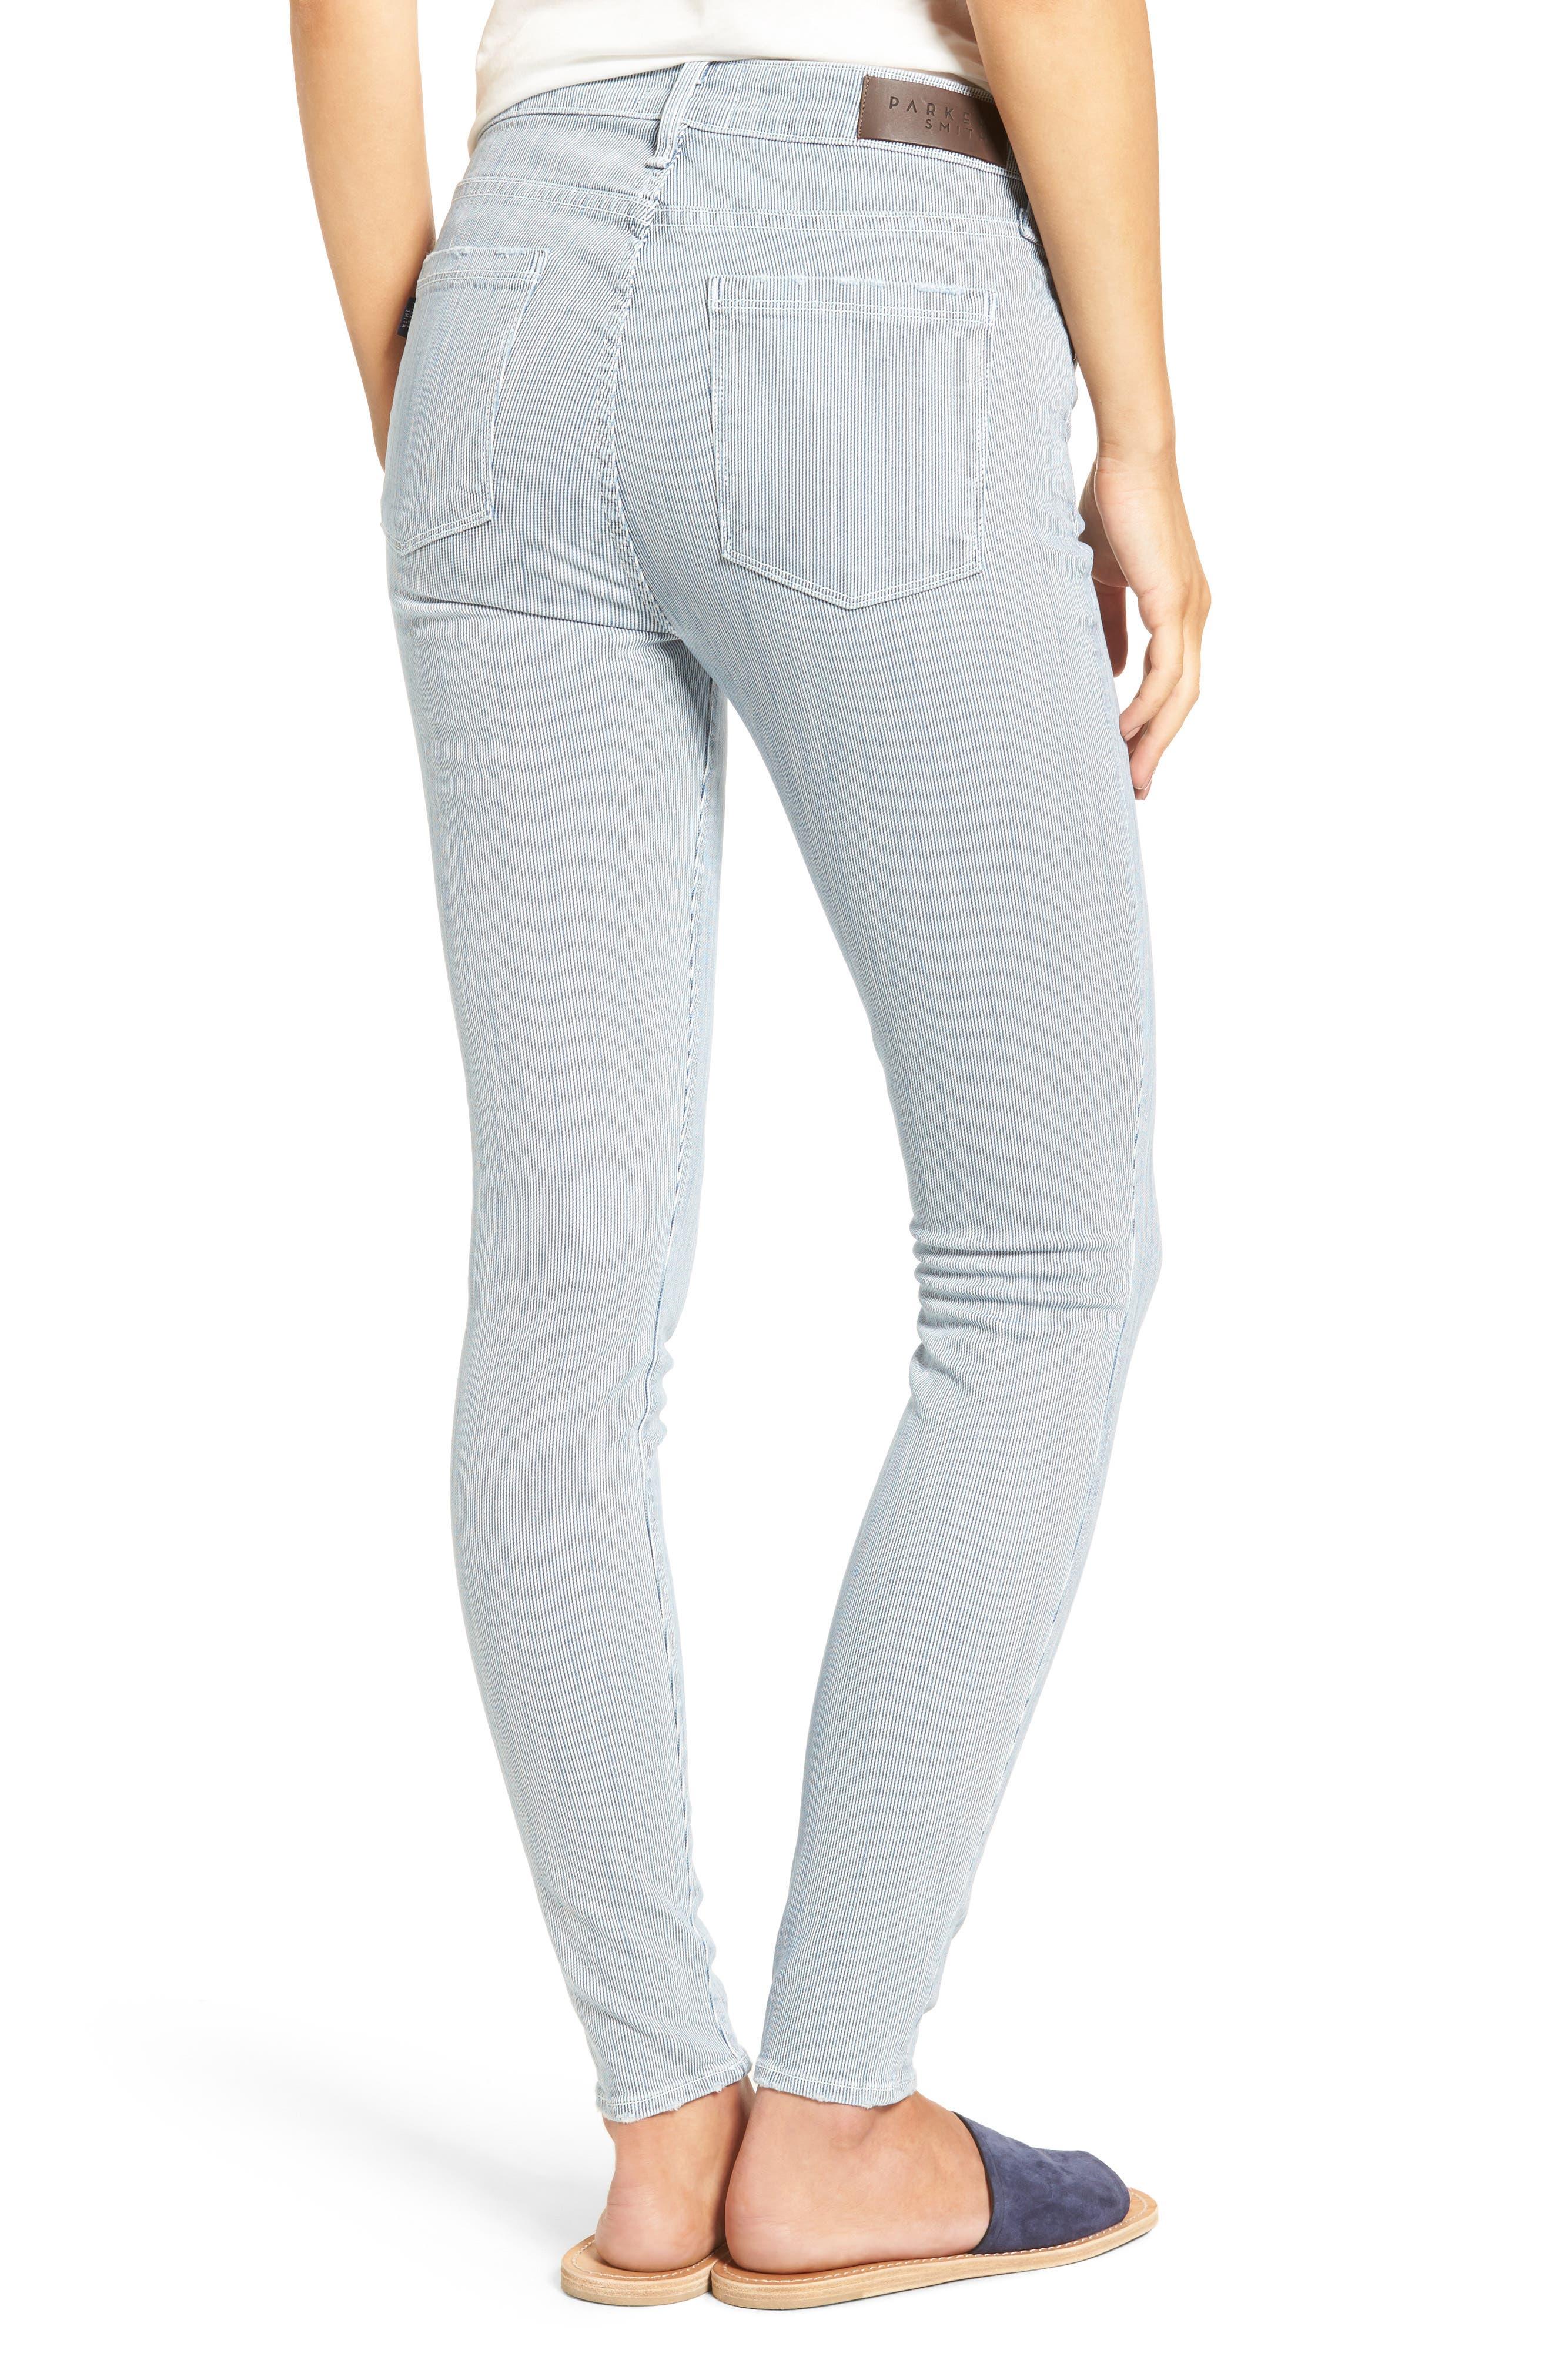 Alternate Image 2  - PARKER SMITH Ava Railroad Stripe Skinny Jeans (Engineer)